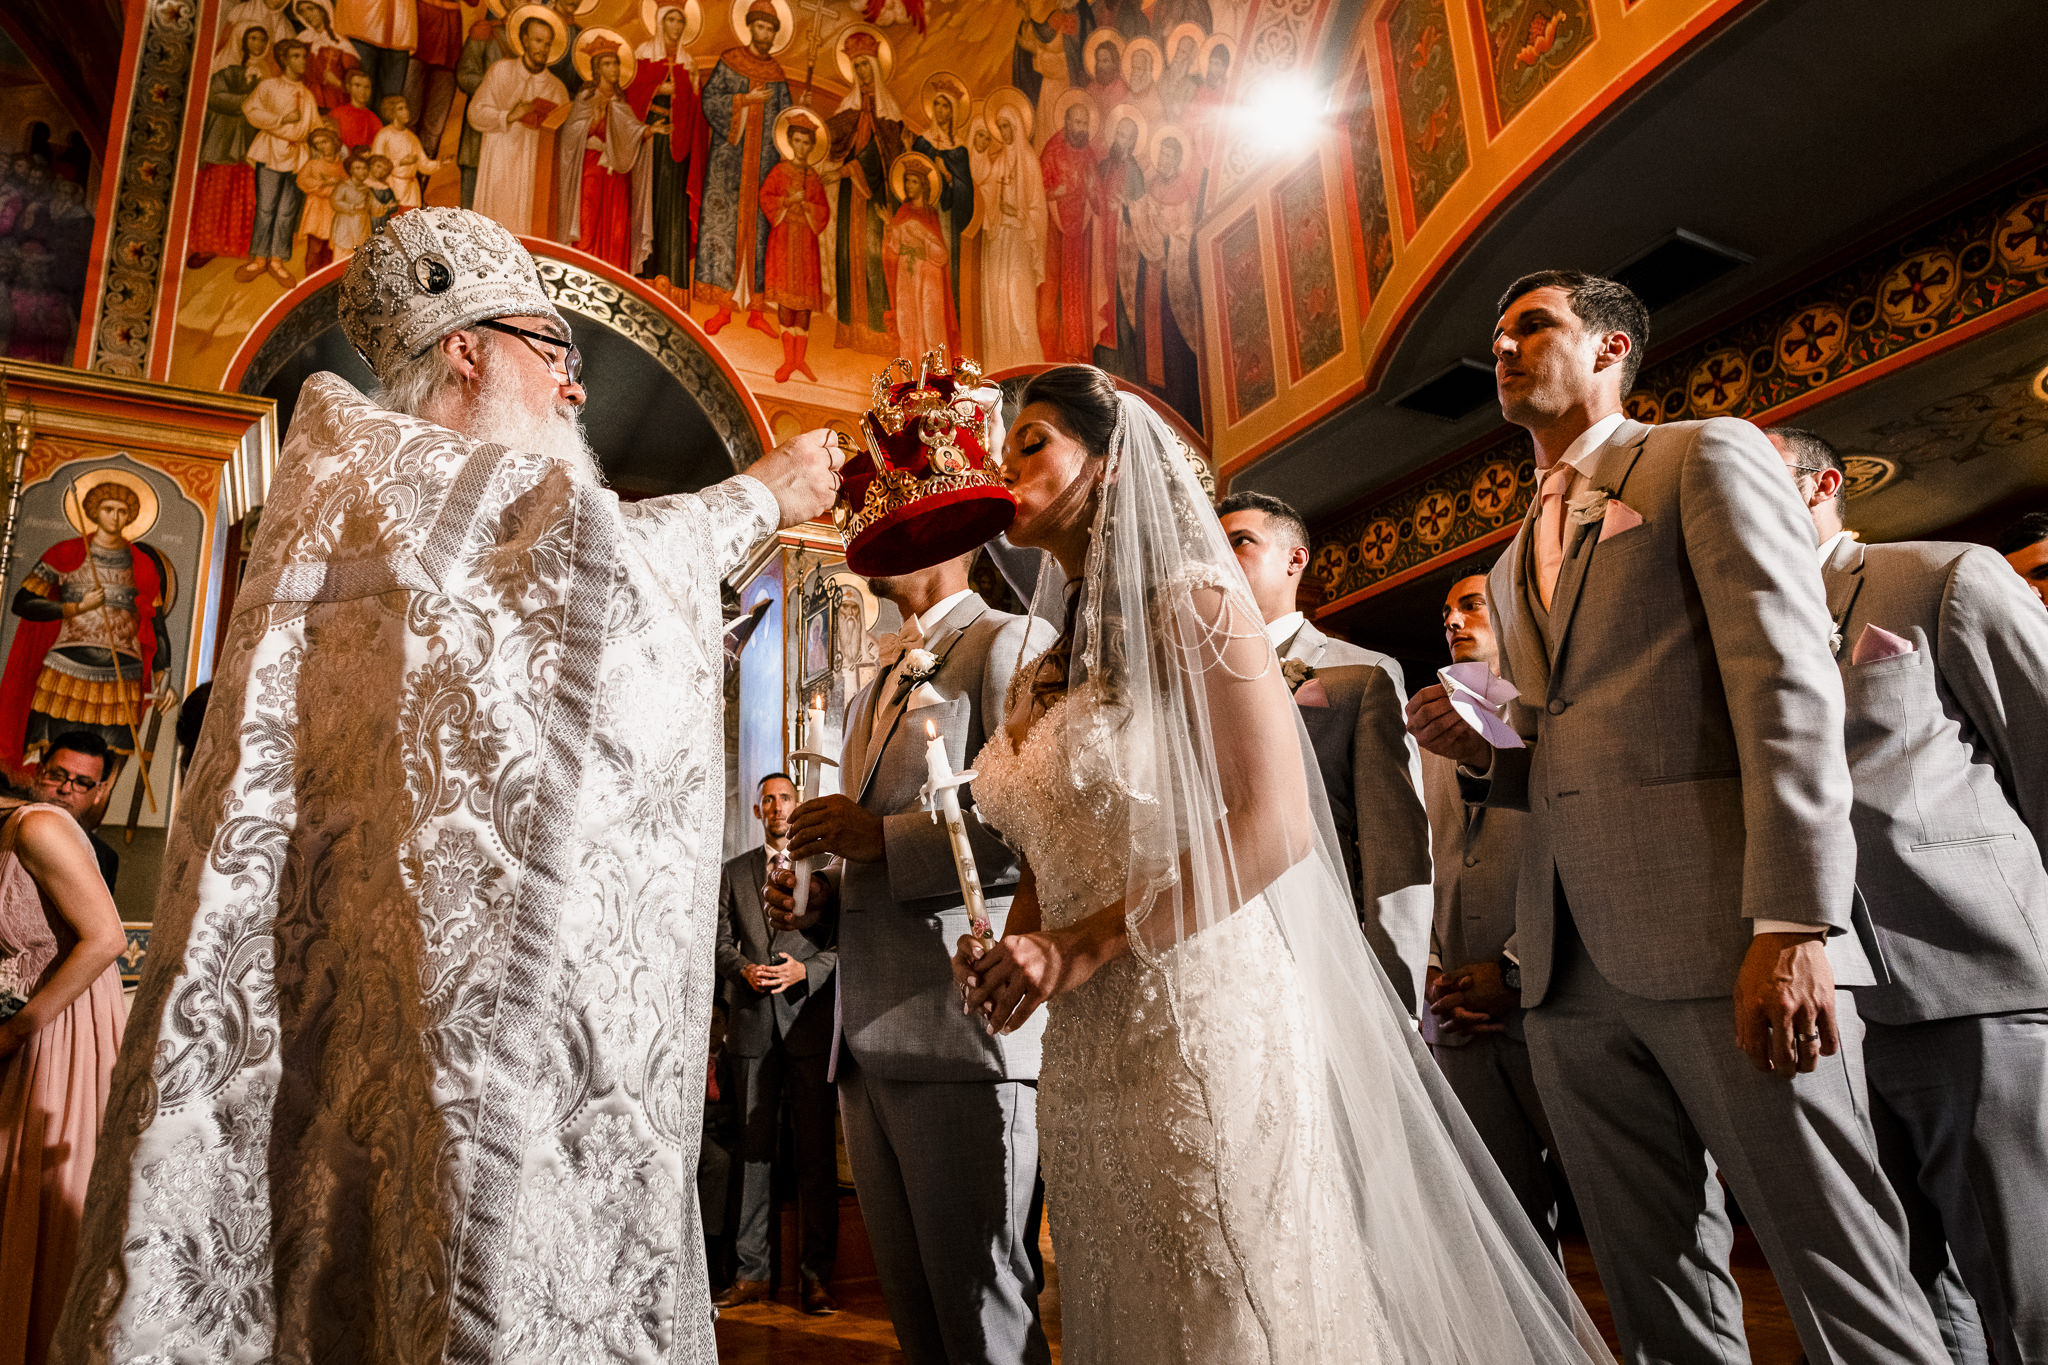 Barbato-Moorestown-Community-House-Wedding-New-Jersey-Photographer-10.JPG